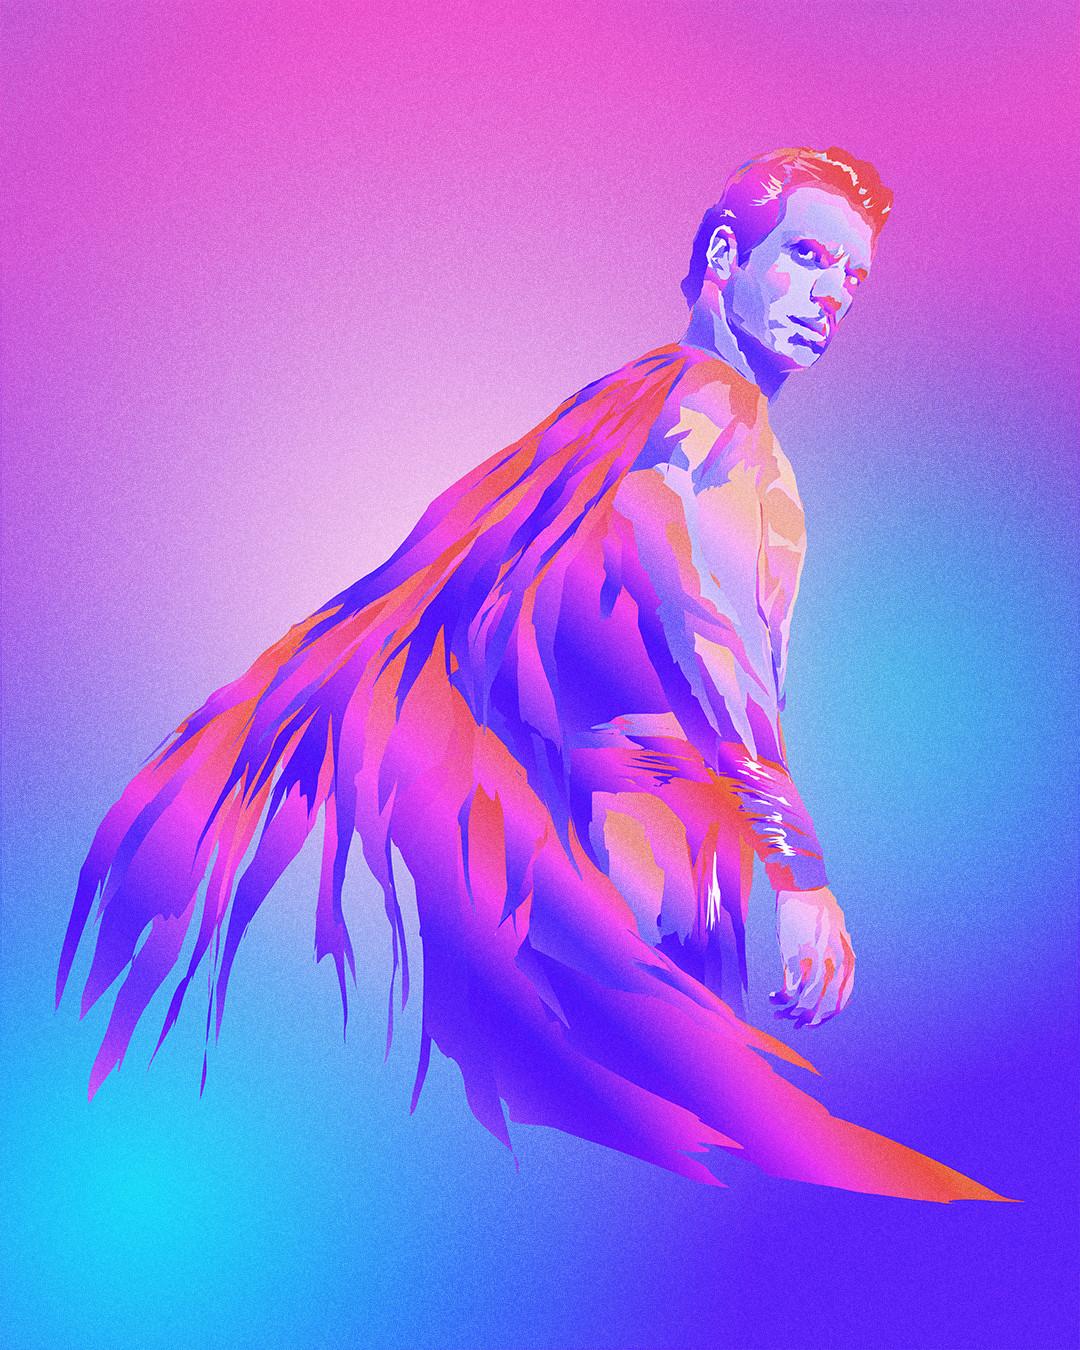 Nick tam full masaolab justiceleague colorillustration superman v1